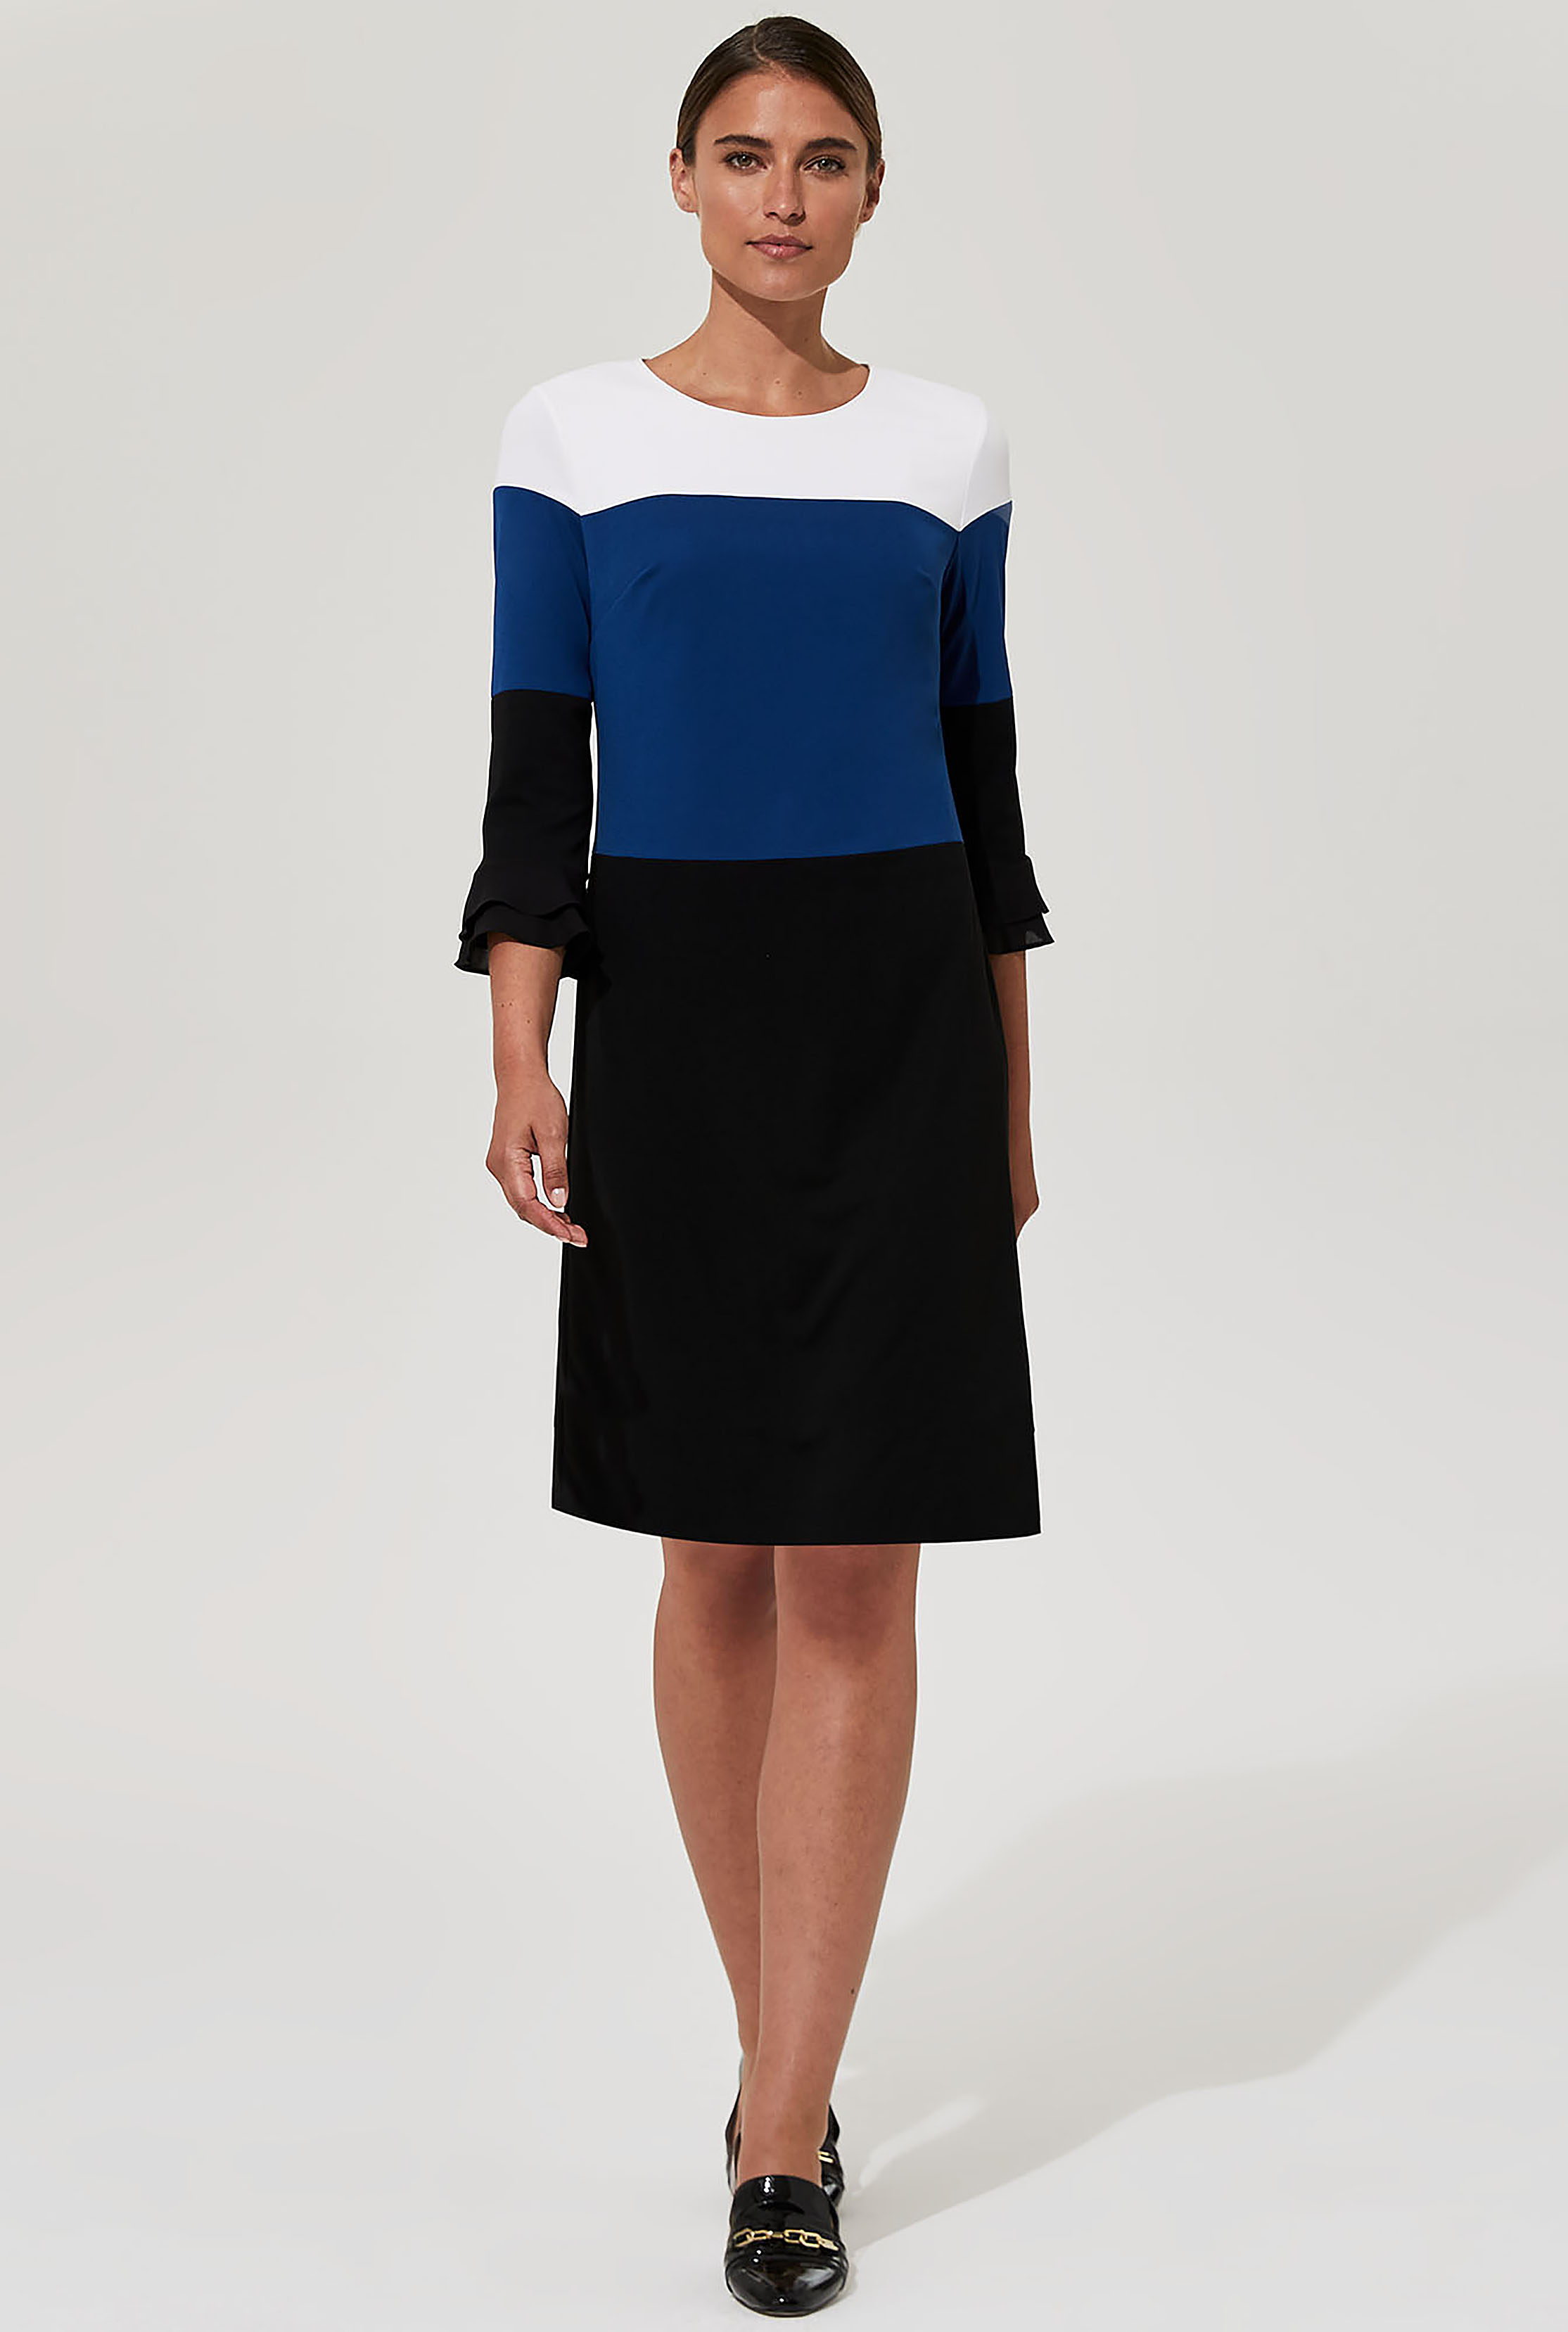 Karl Lagerfeld Paris Black and Blue Colour Block Dress